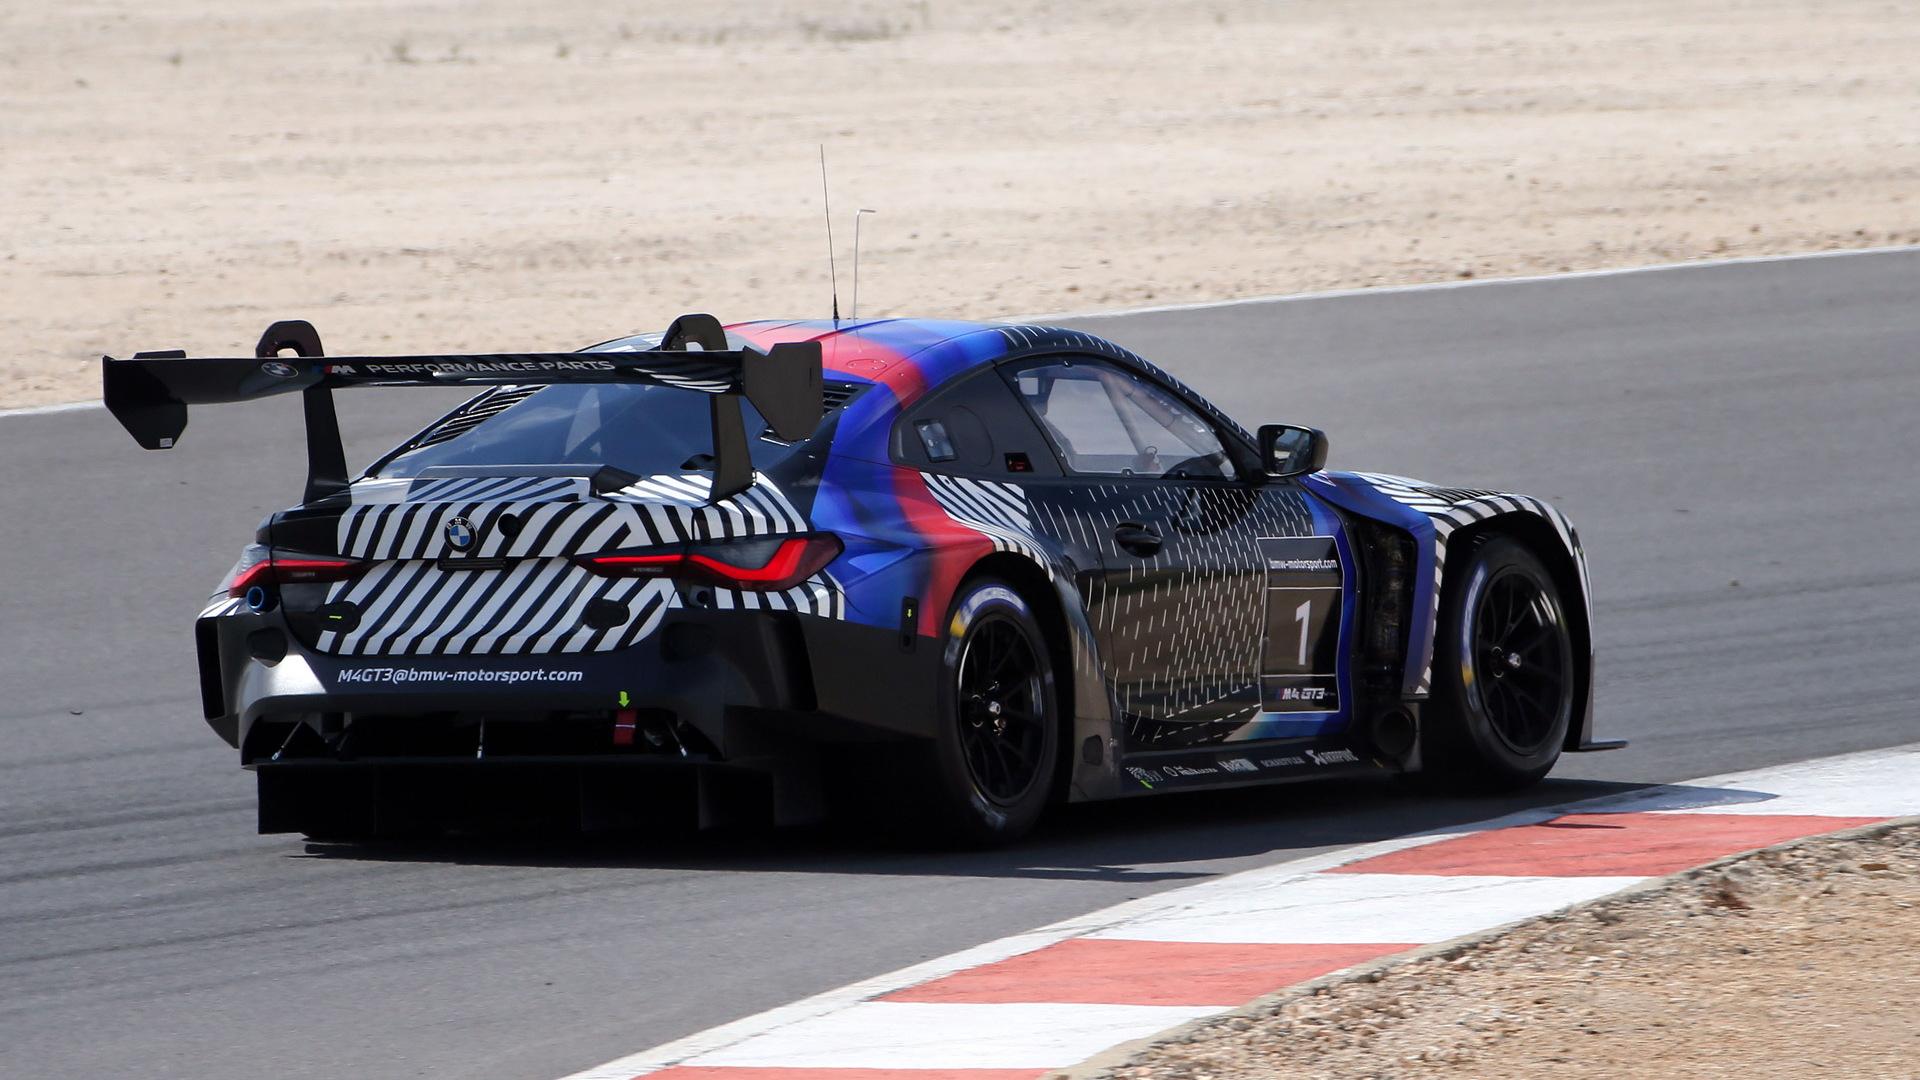 2022 BMW M4 GT3 race car prototype